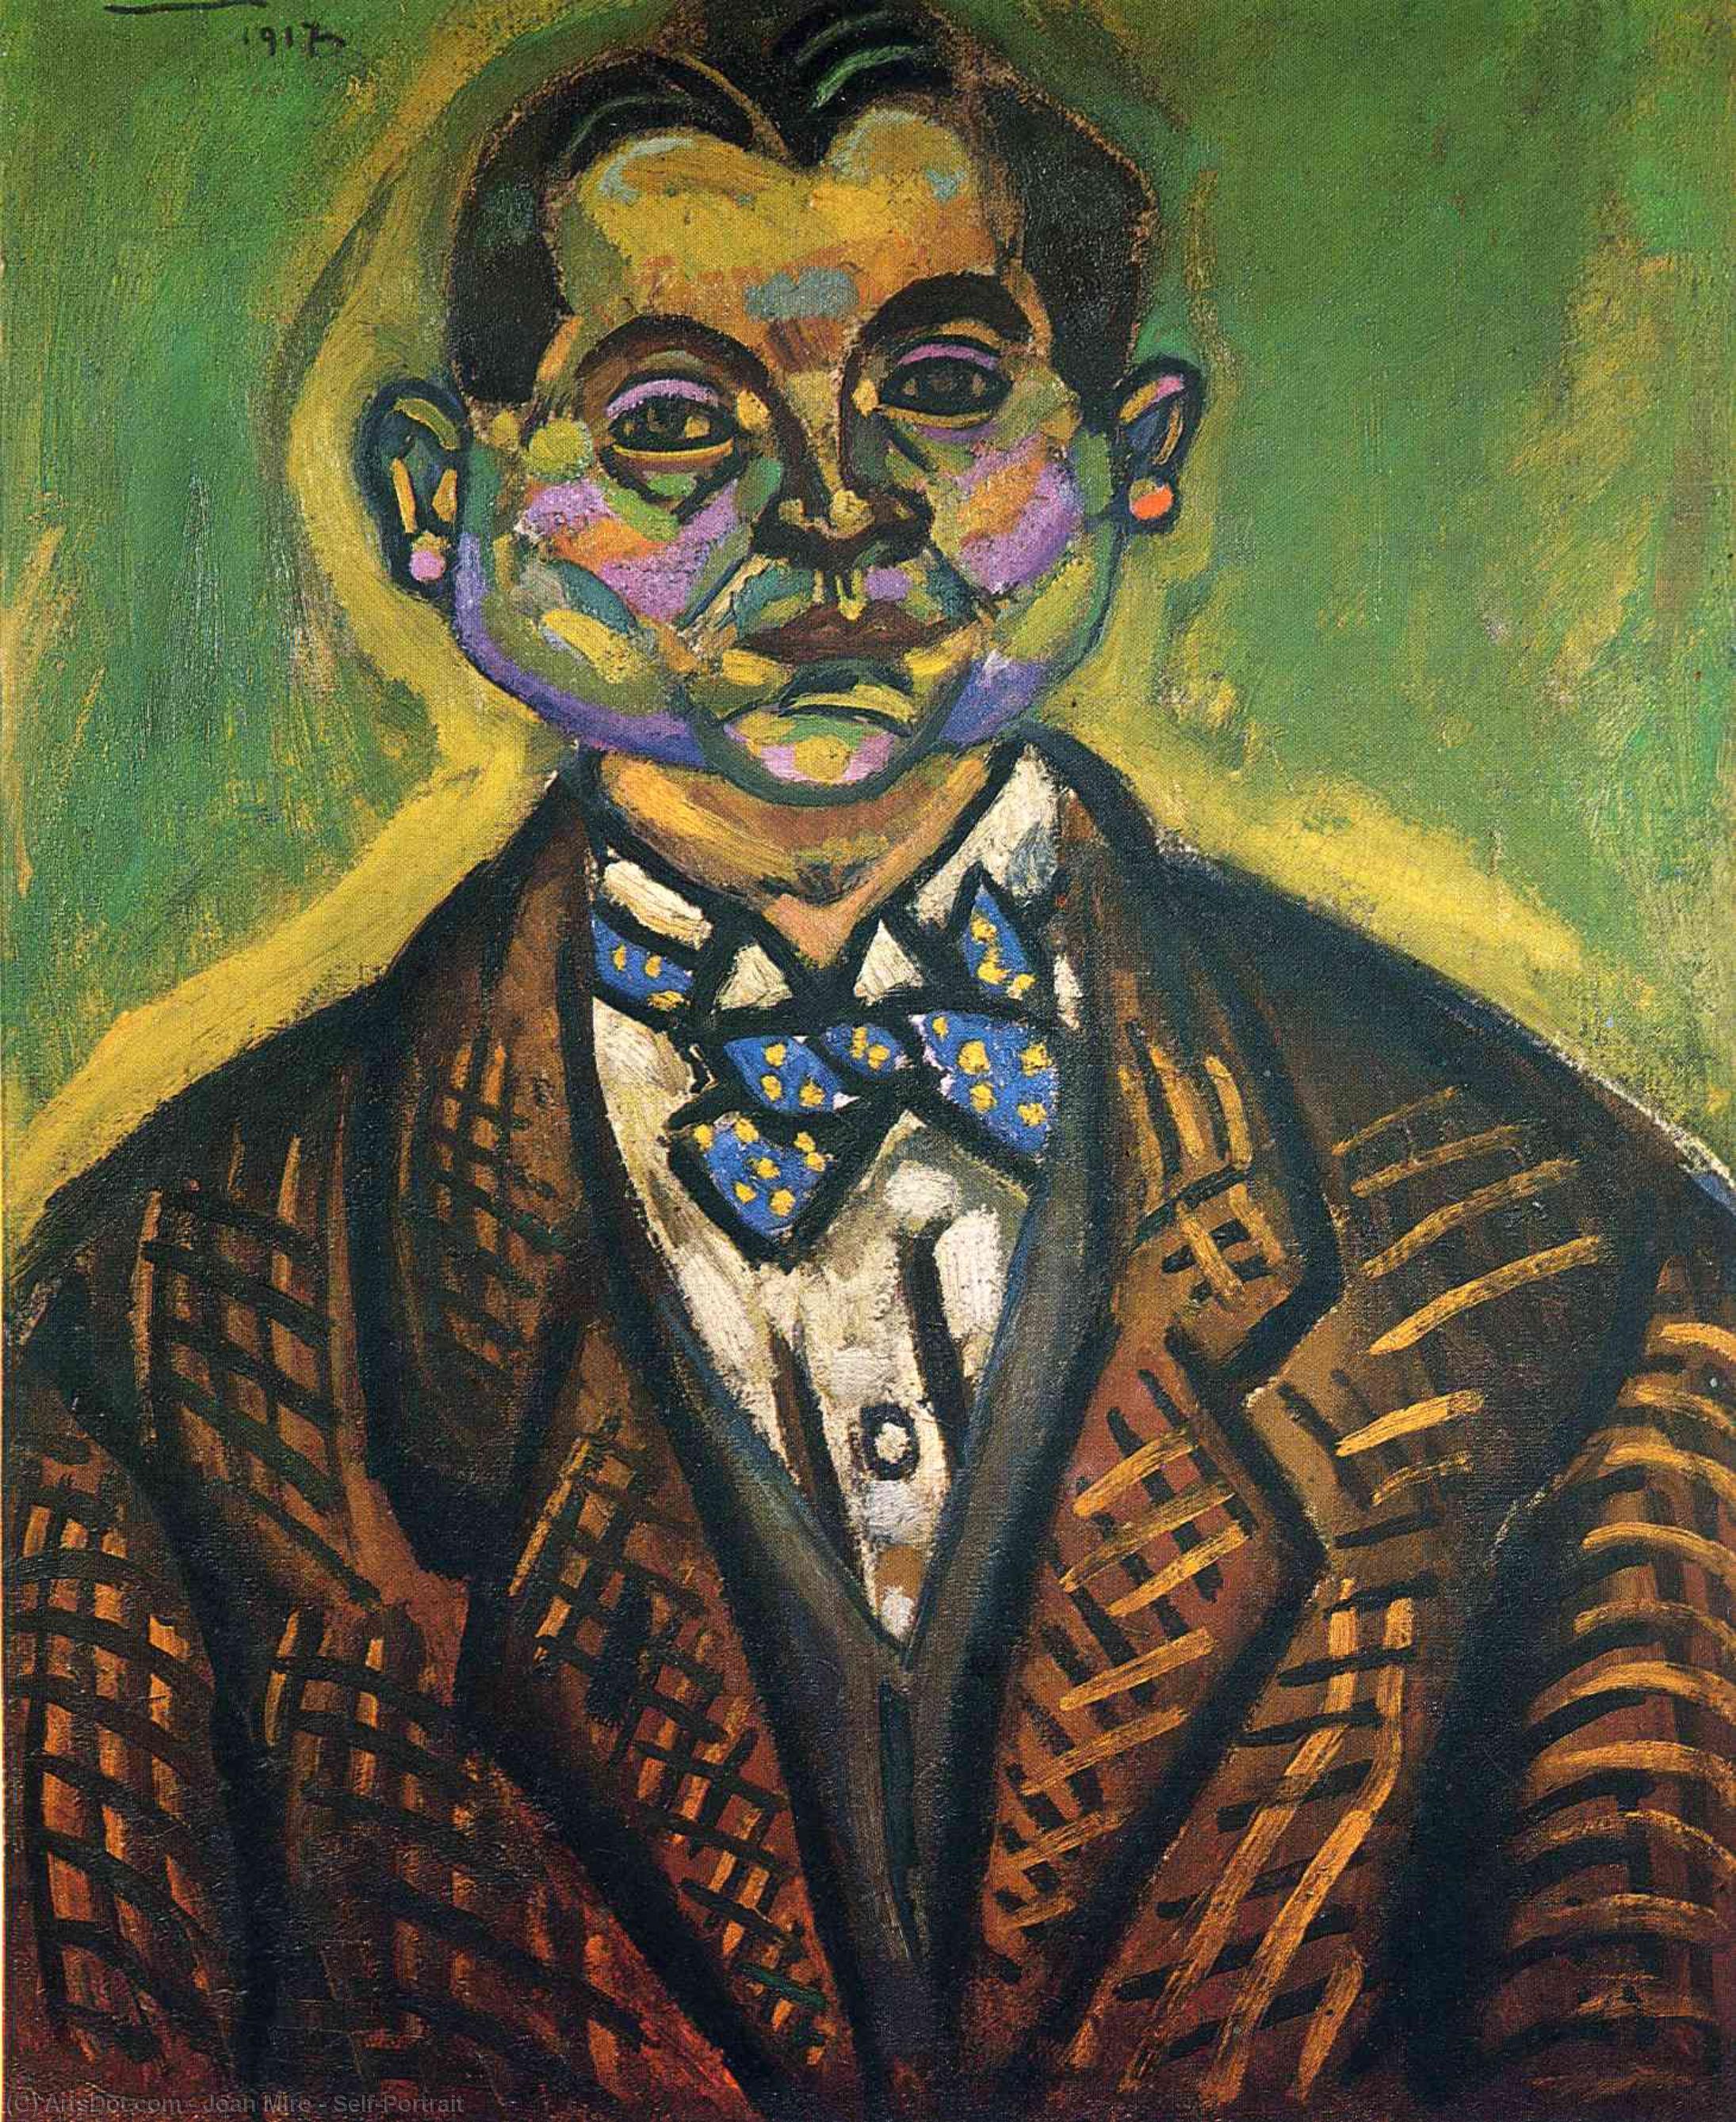 Wikioo.org - The Encyclopedia of Fine Arts - Painting, Artwork by Joan Miro - Self-Portrait